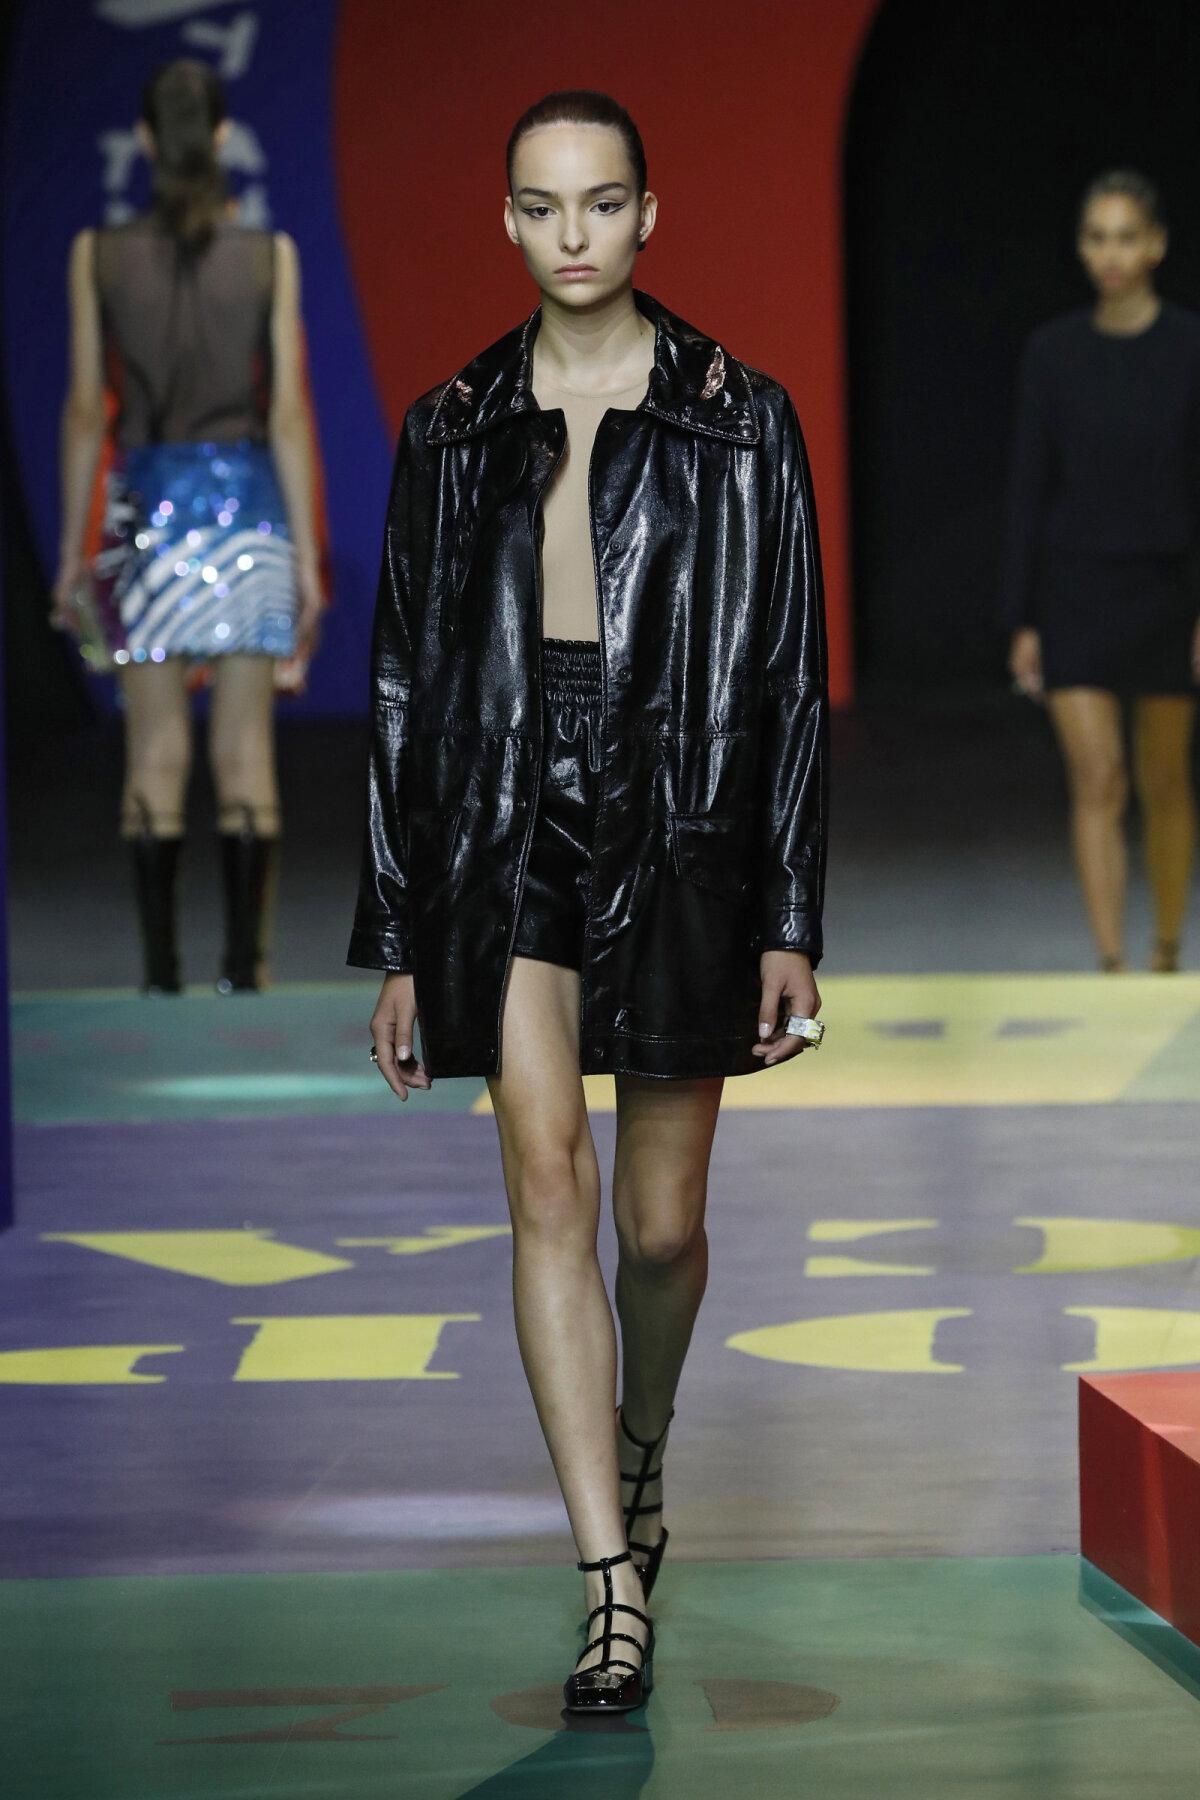 Christian Dior Collection Haute Couture fall 2021 Paris Fashion Week